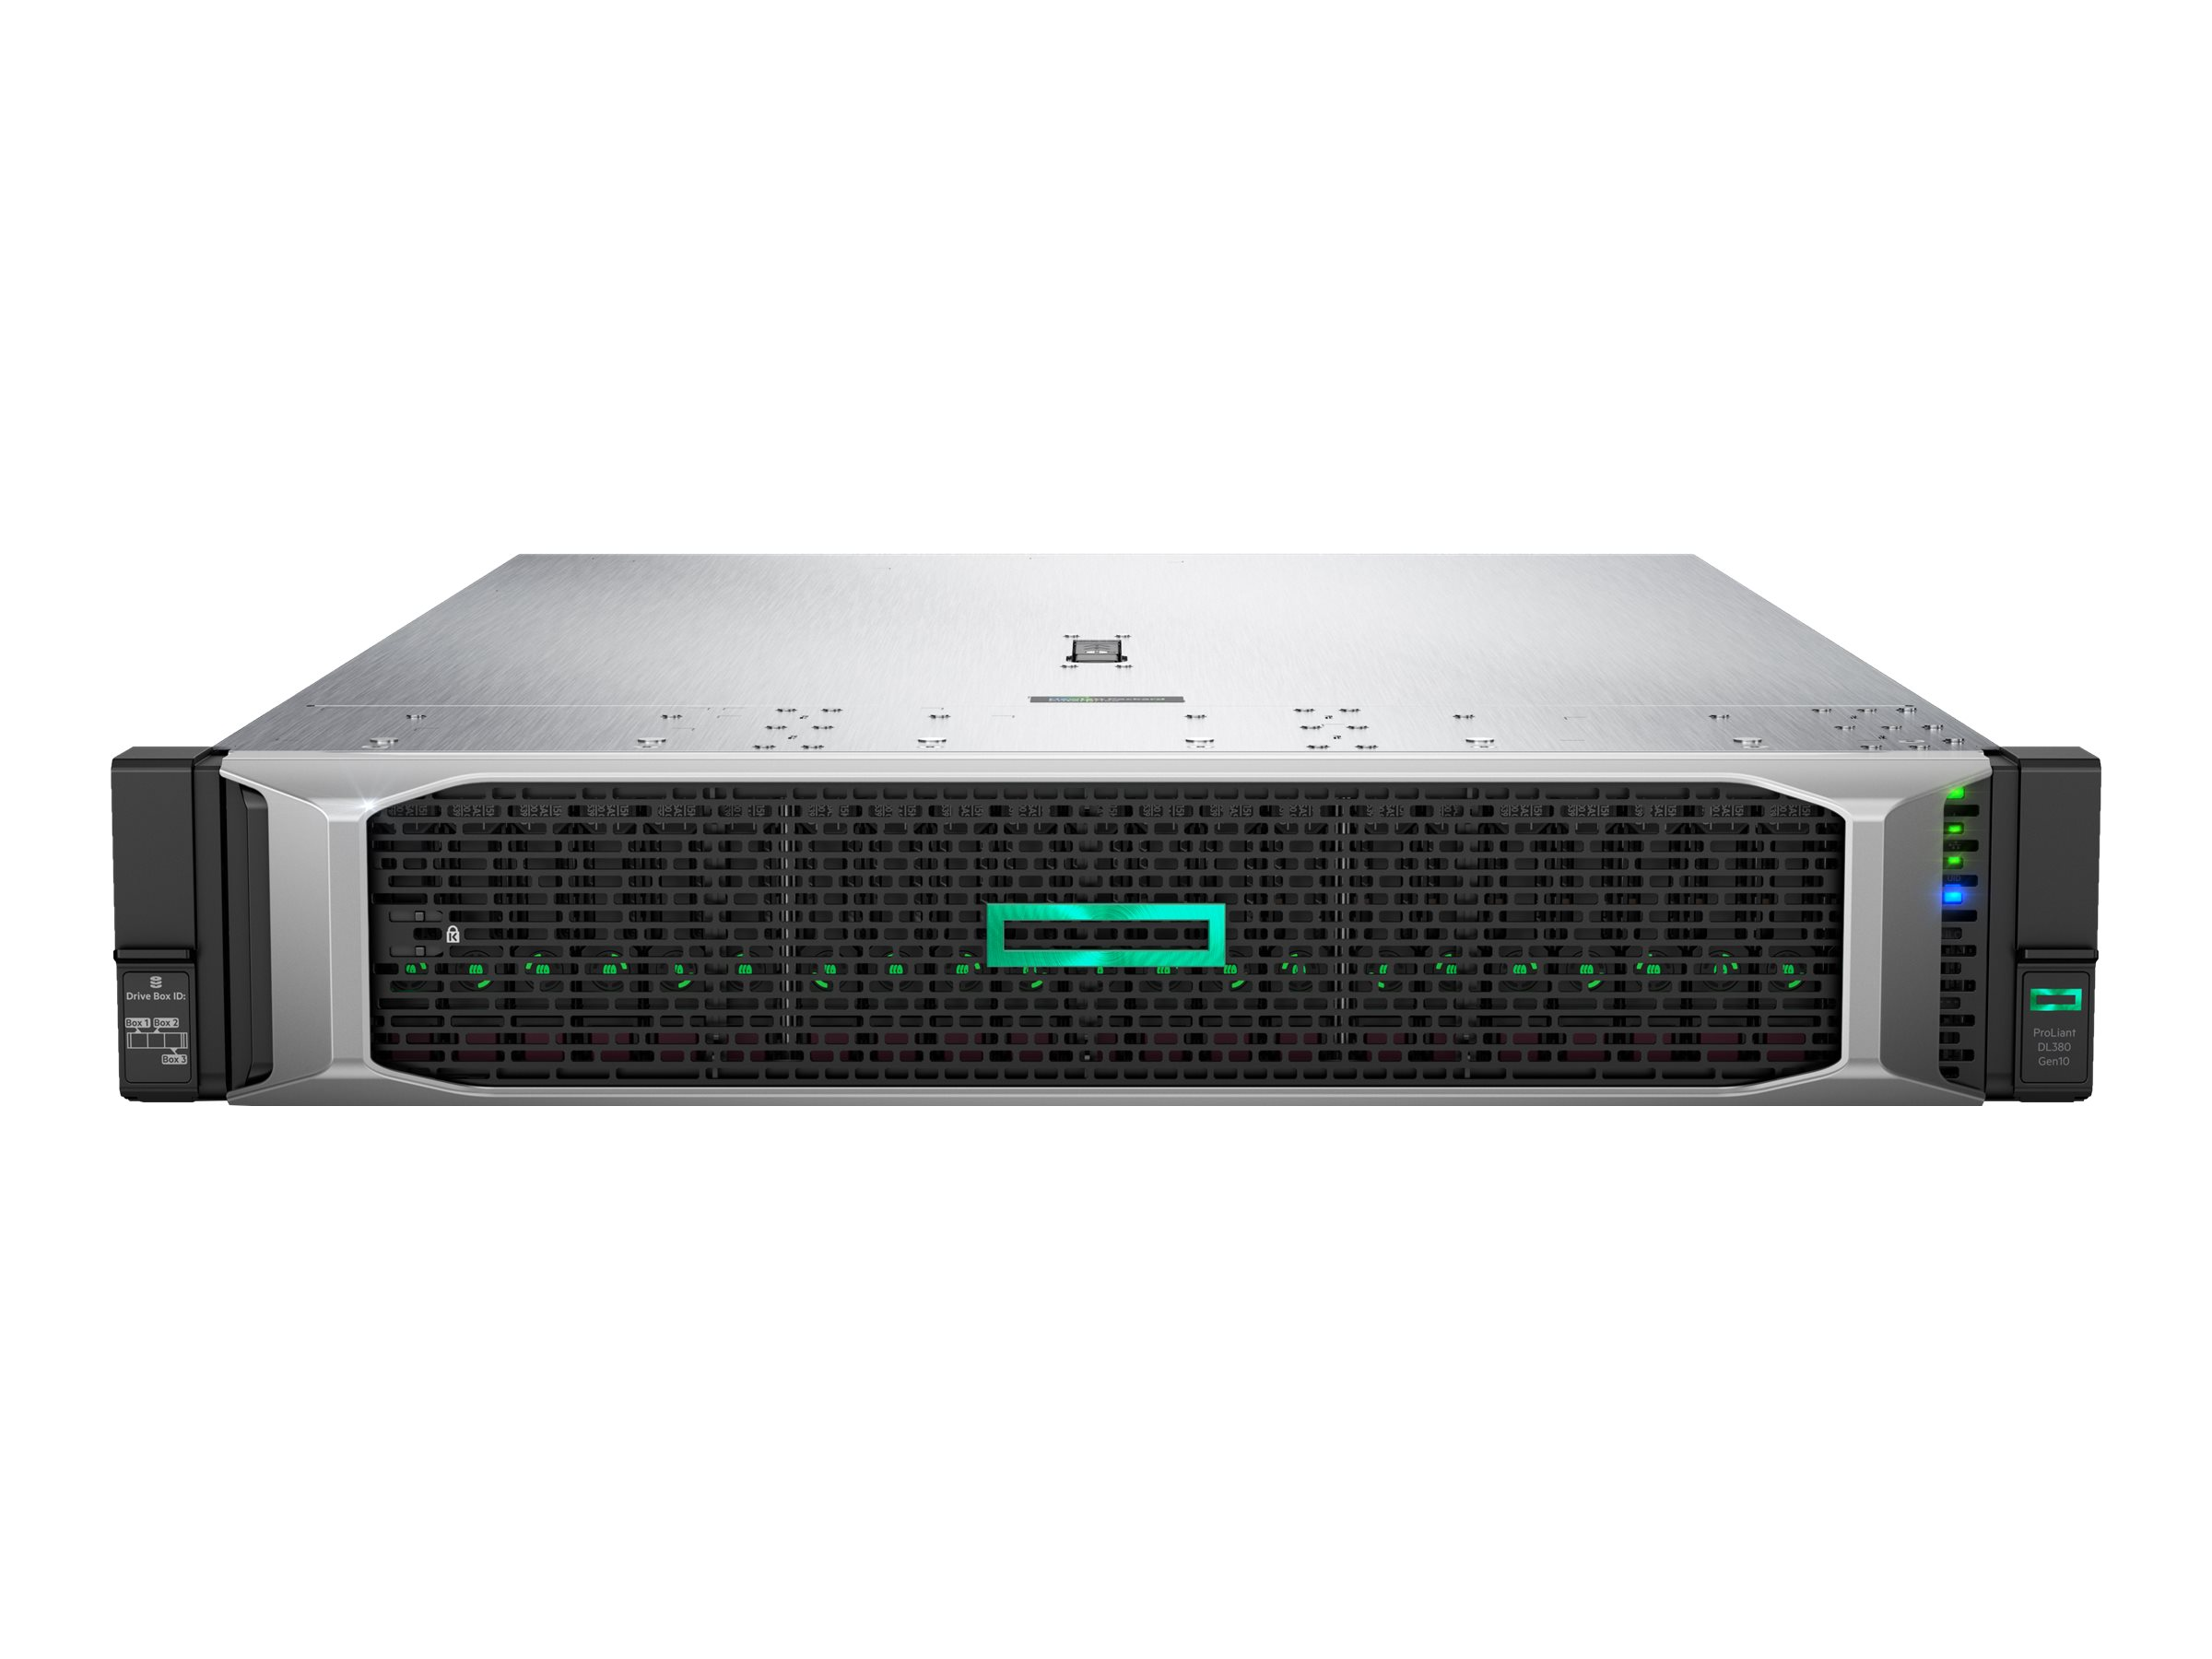 HPE ProLiant DL380 Gen10 - Server - Rack-Montage - 2U - zweiweg - RAM 0 GB